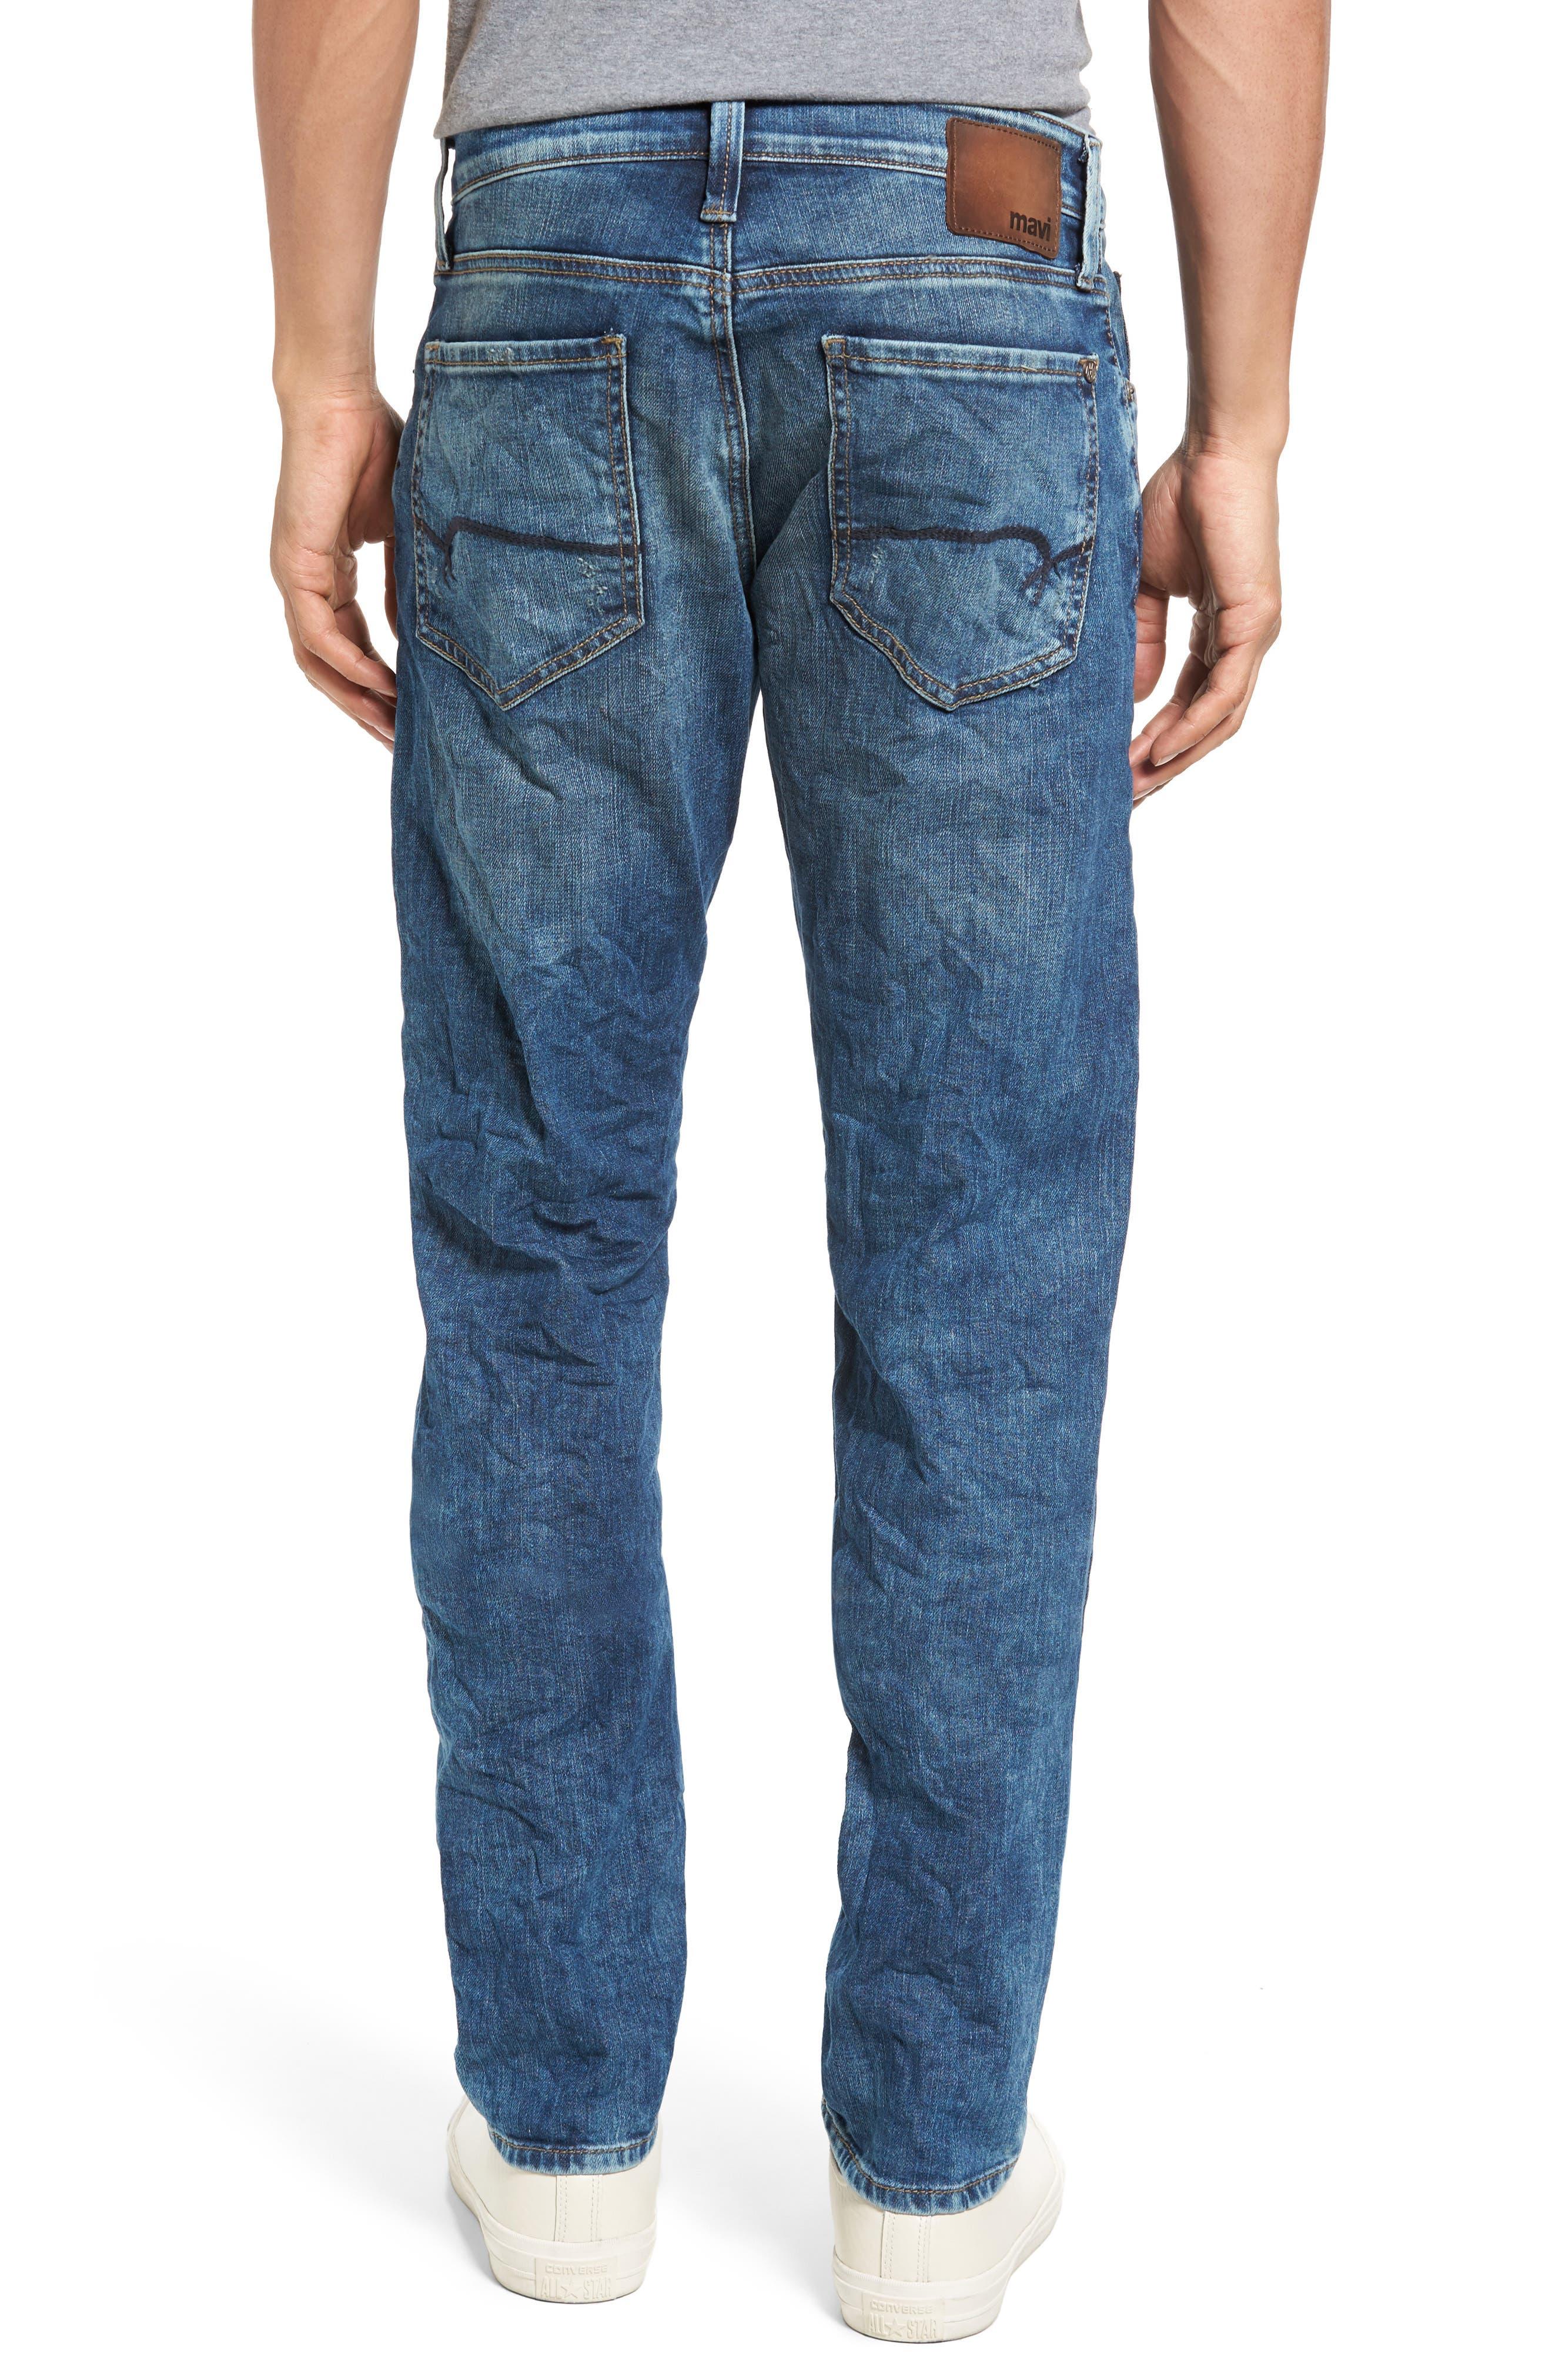 Jake Easy Slim Fit Jeans,                             Alternate thumbnail 2, color,                             420